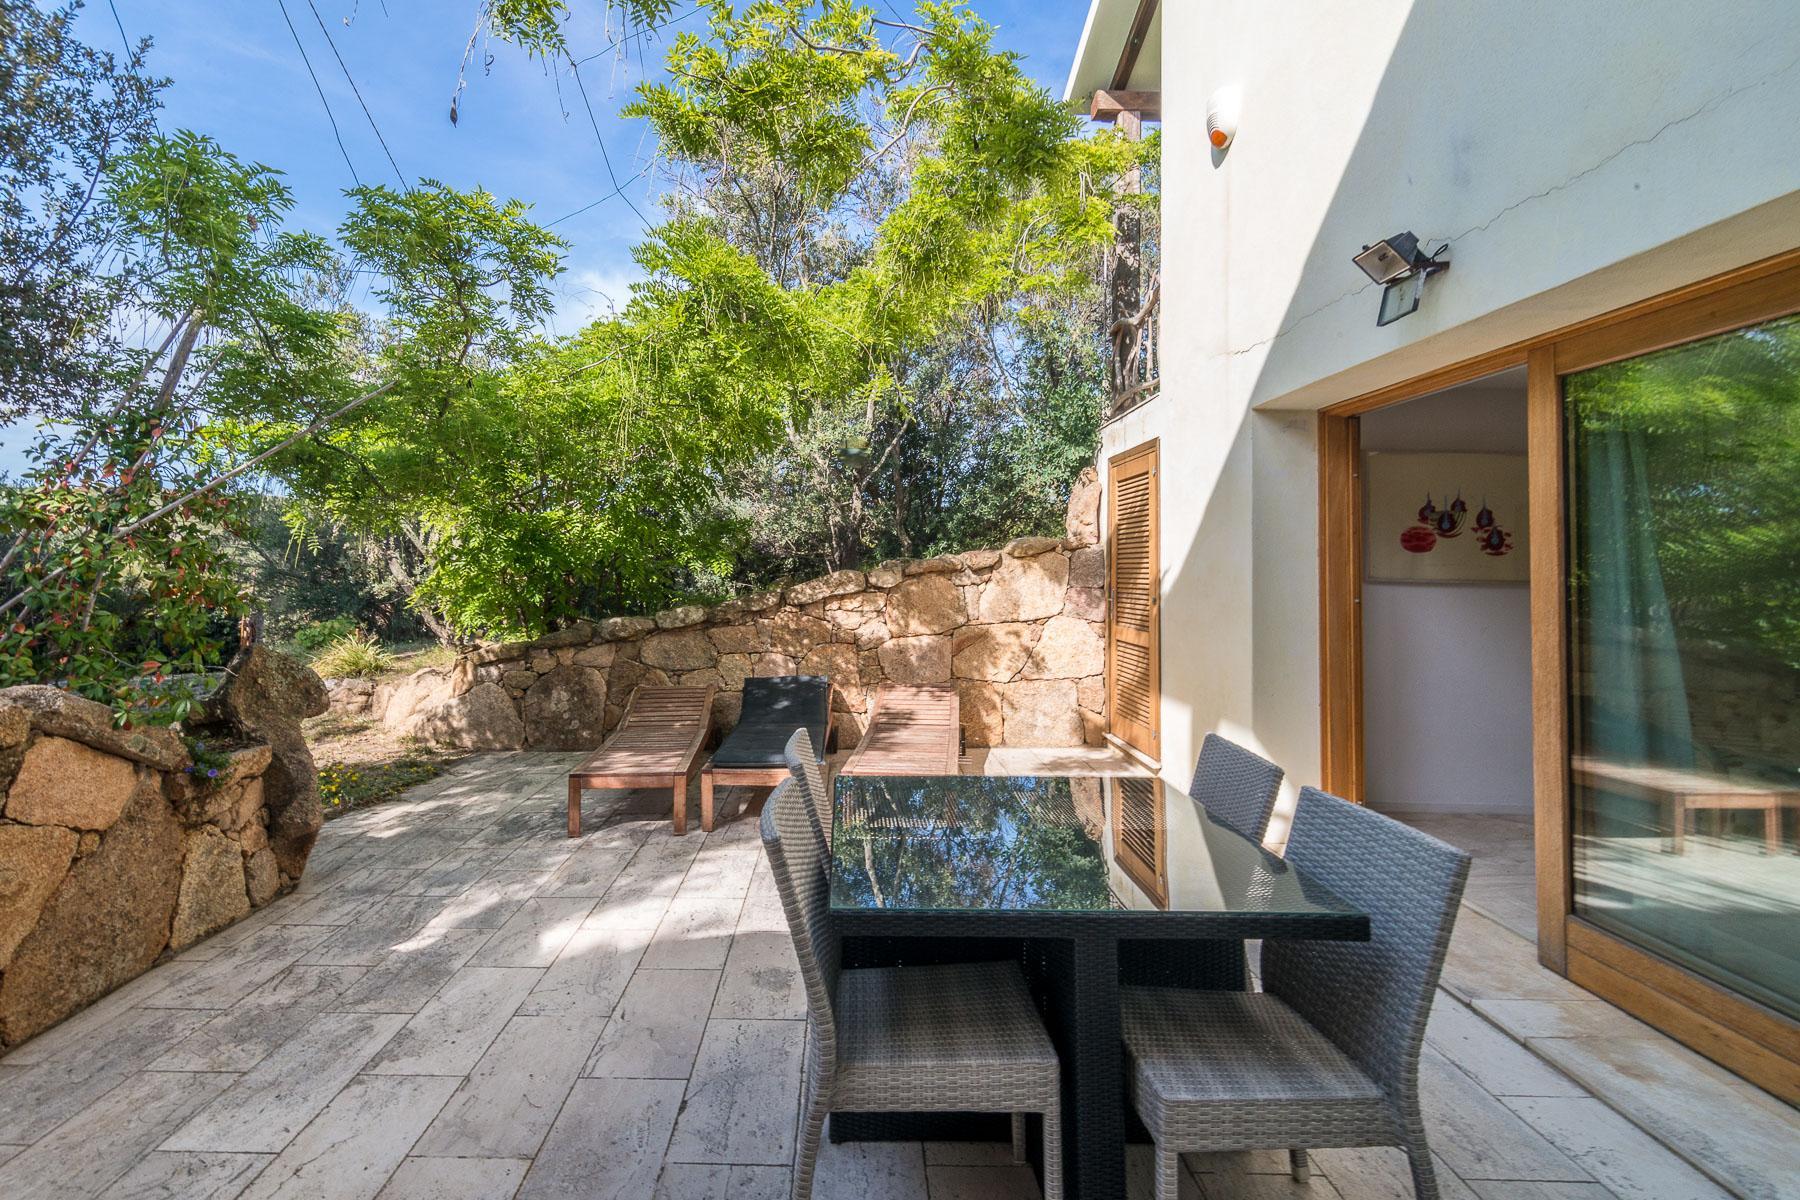 Golfo Aranci Sos Aranzos Wonderfull Villa with direct access to the beach - 20